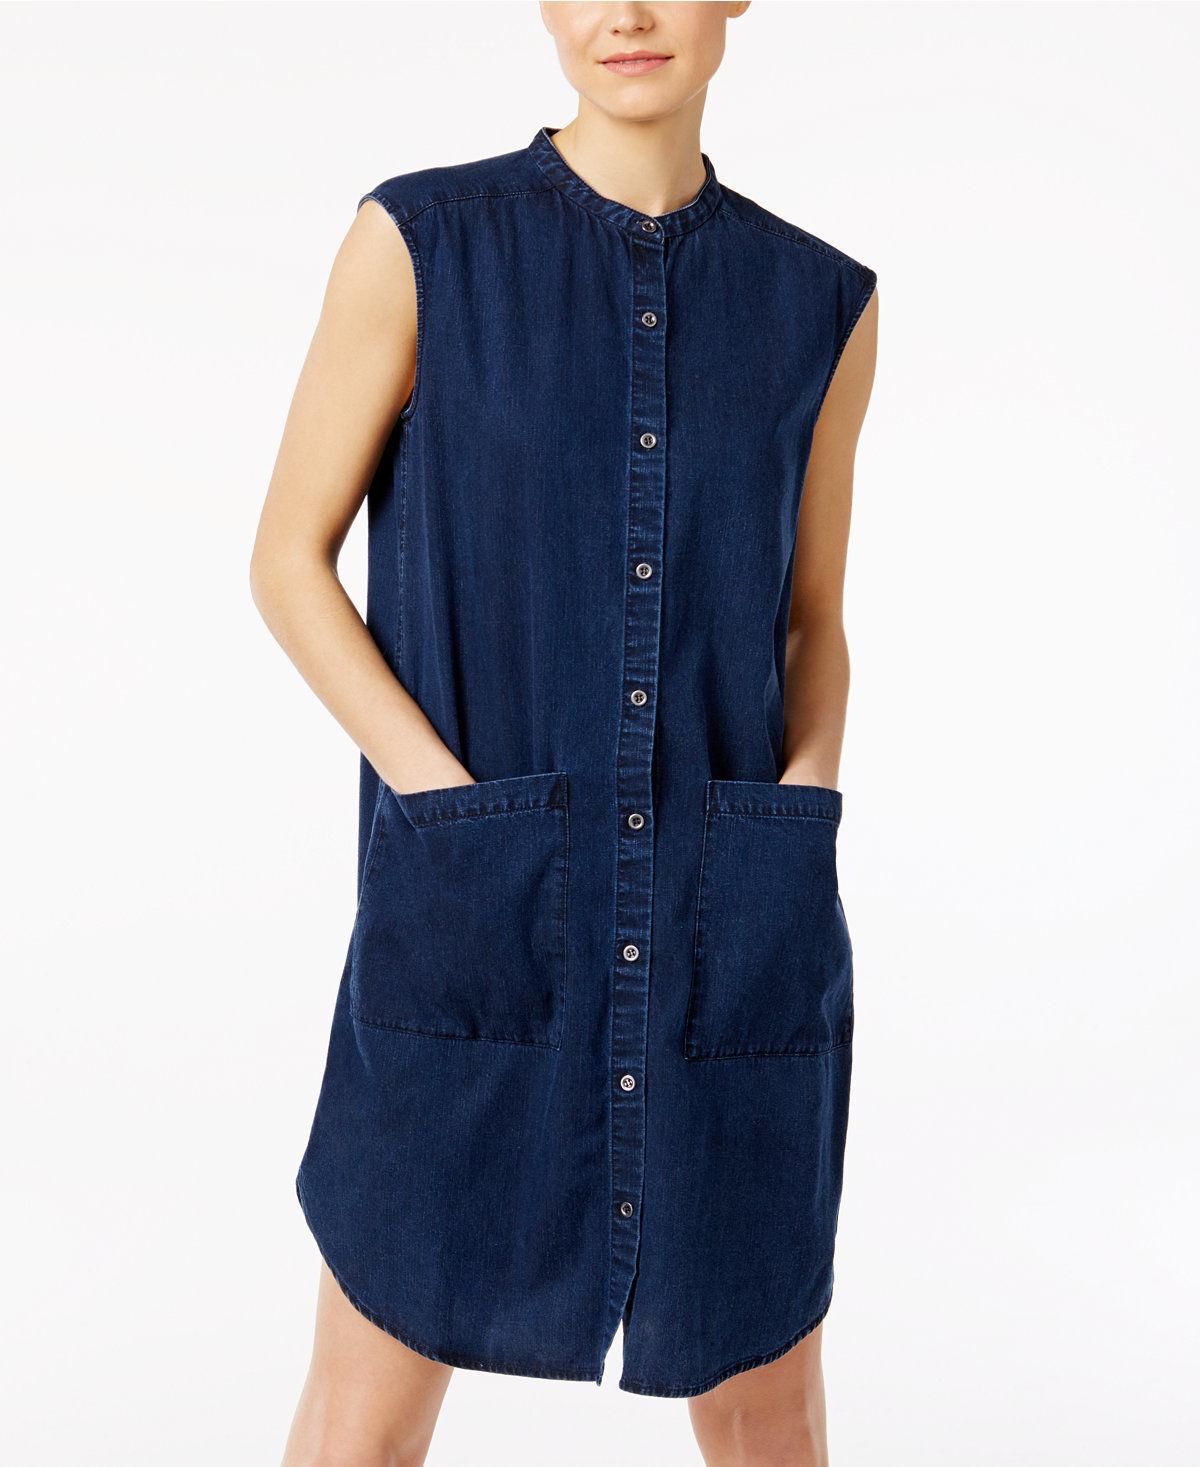 218 Eileen Fisher Midnight bluee Tencel Organic Cotton Denim Tunic Dress Size M 7f0e4f